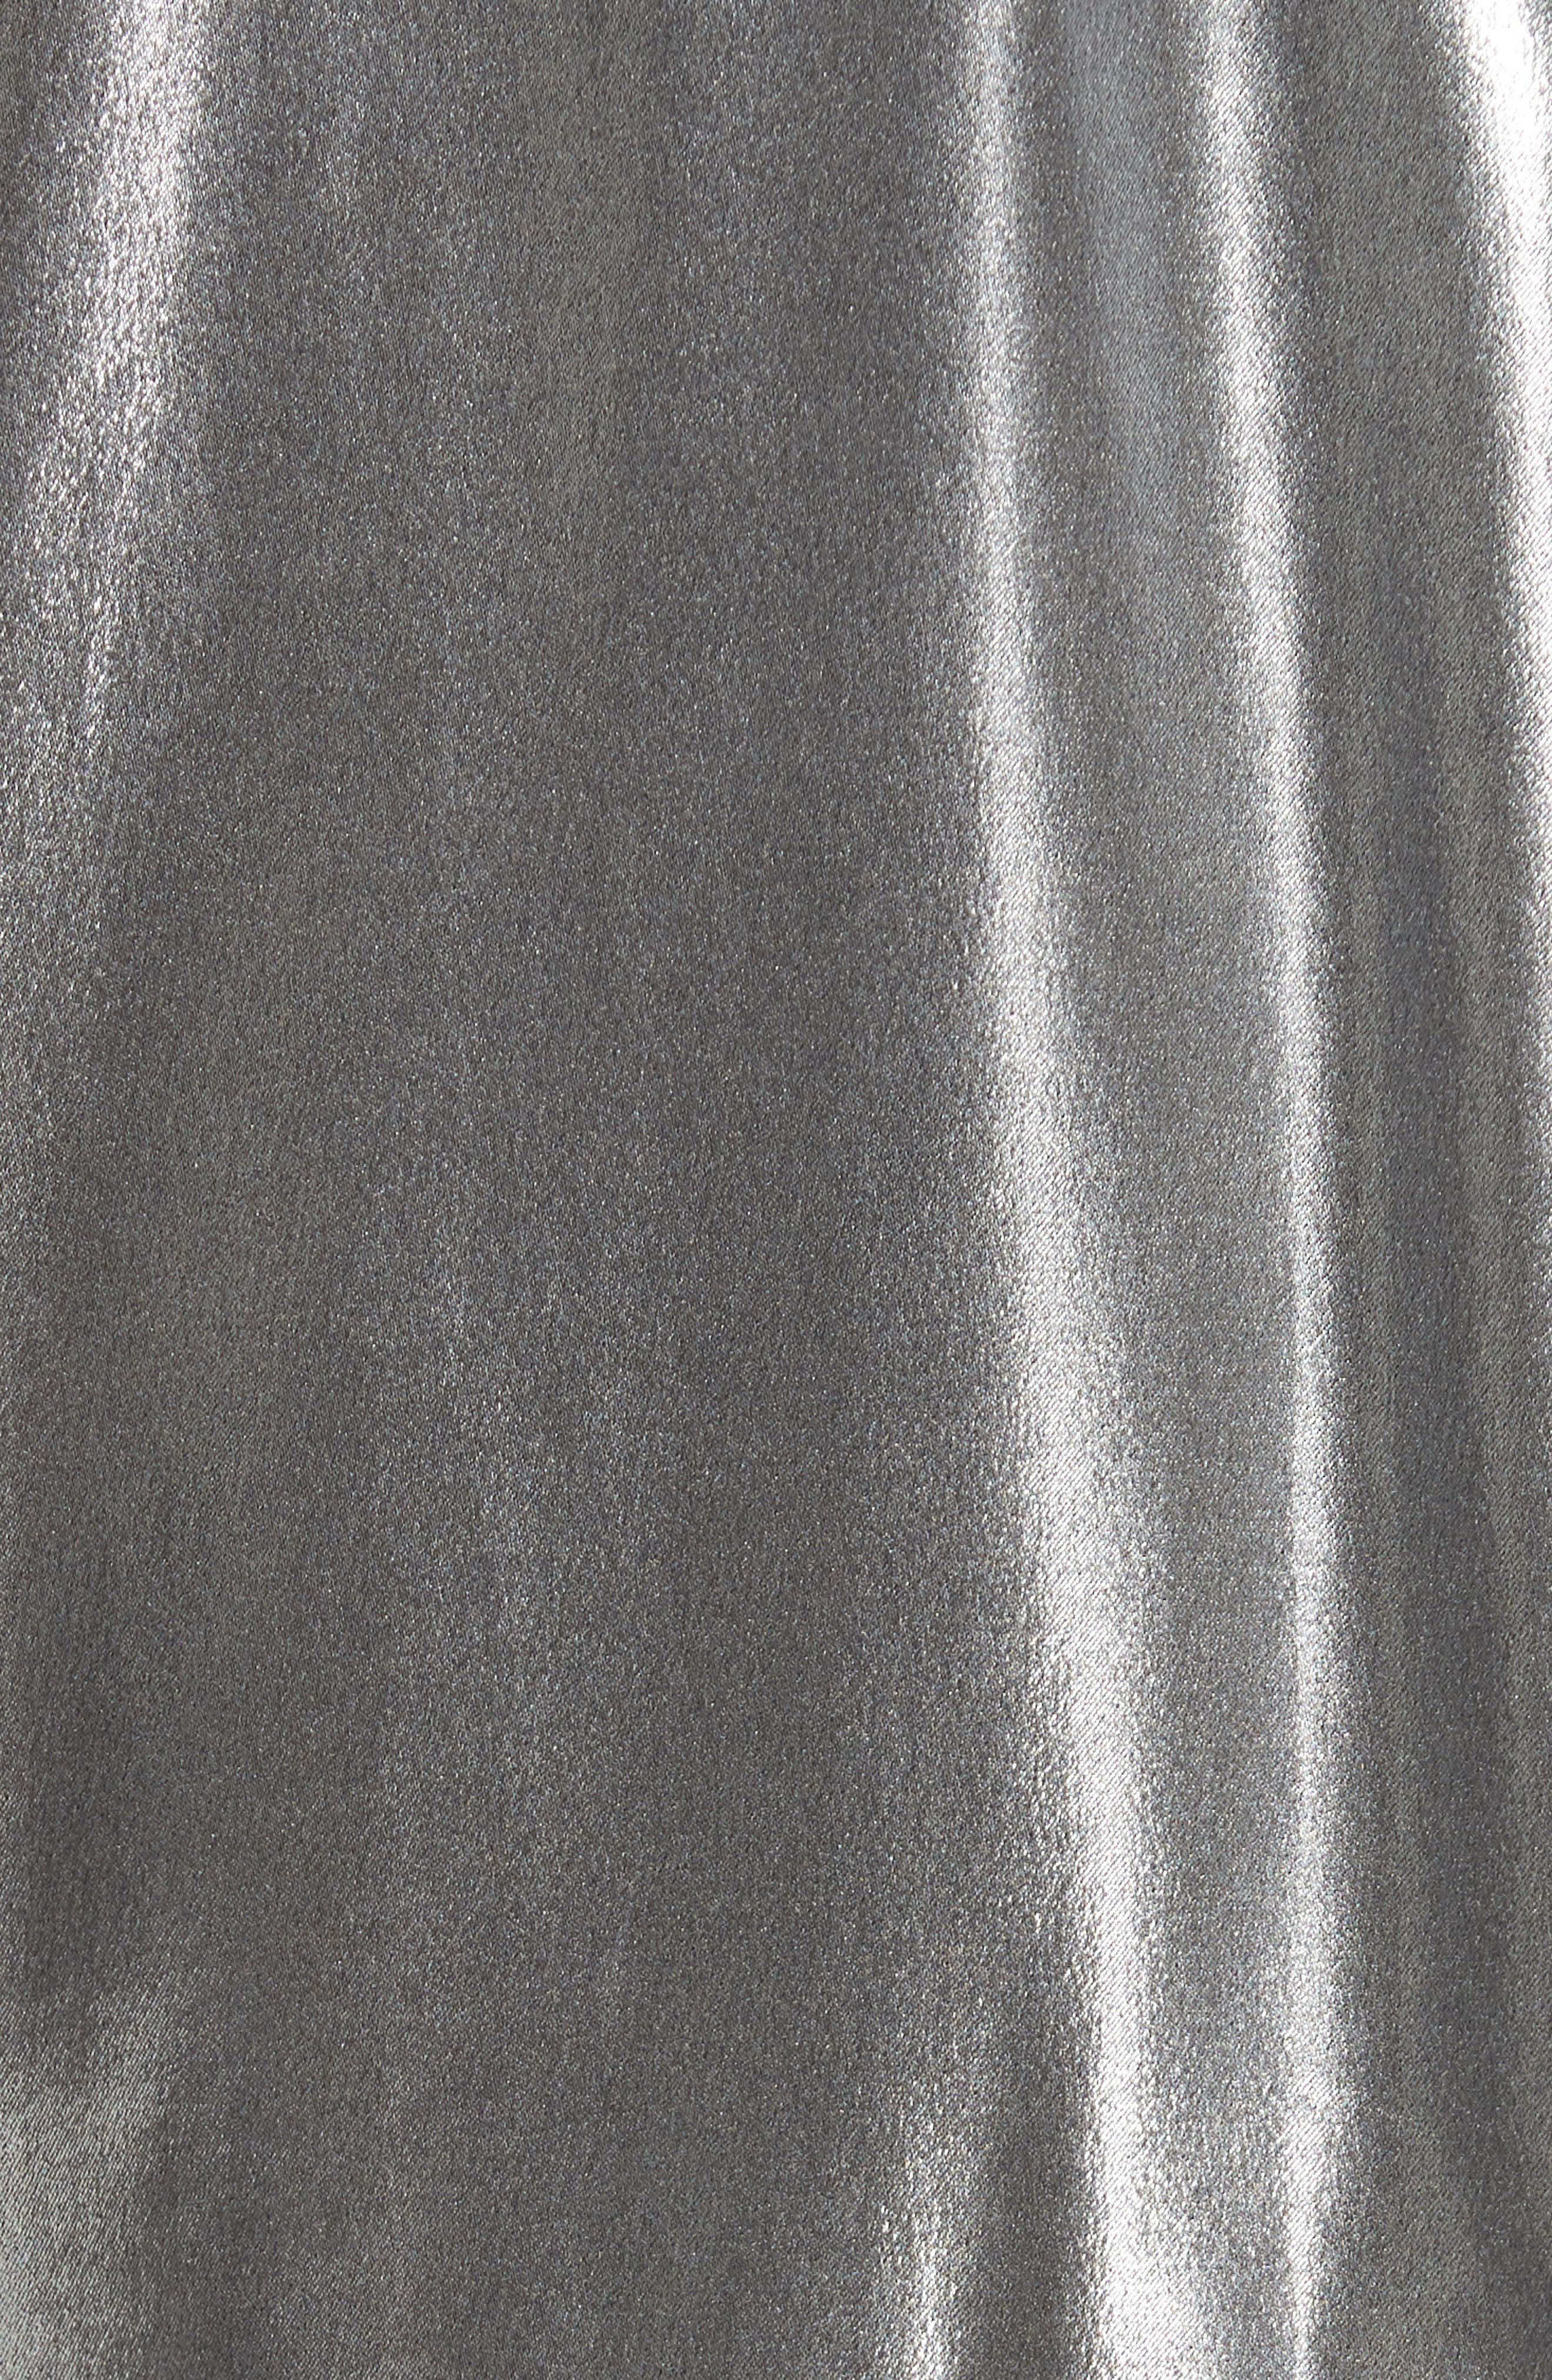 RAG & BONE,                             Sloane Metallic Track Jacket,                             Alternate thumbnail 7, color,                             SILVER/ BLACK